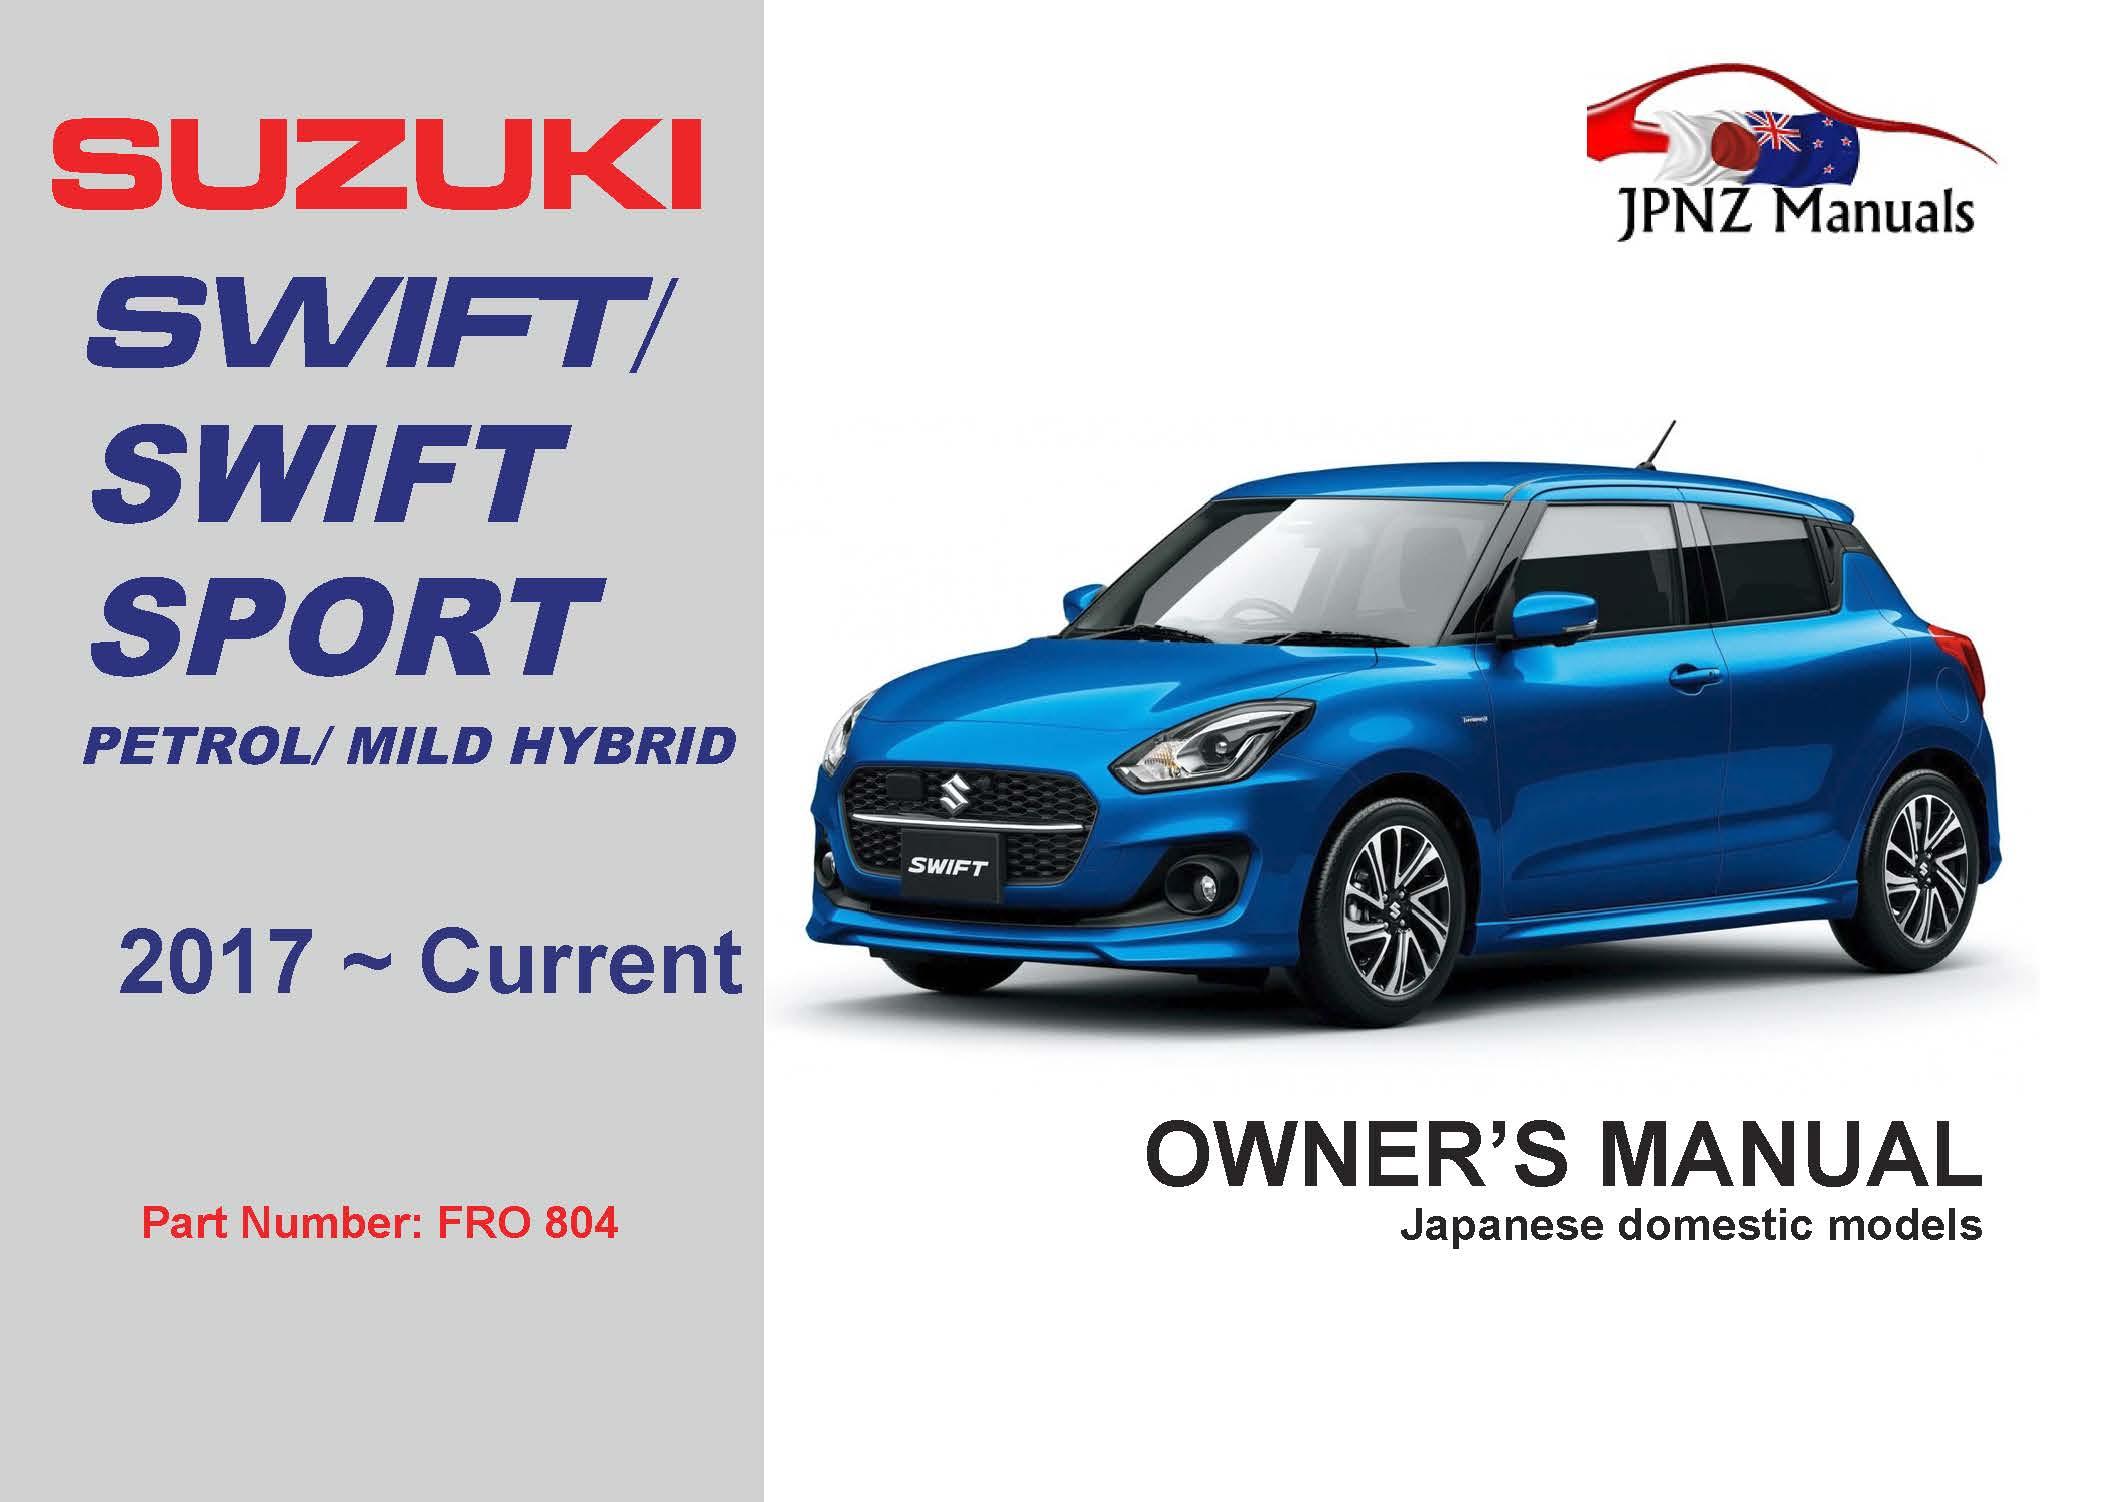 Suzuki – Swift / Swift Sport owners user manual in English | 2017 ~ Current model